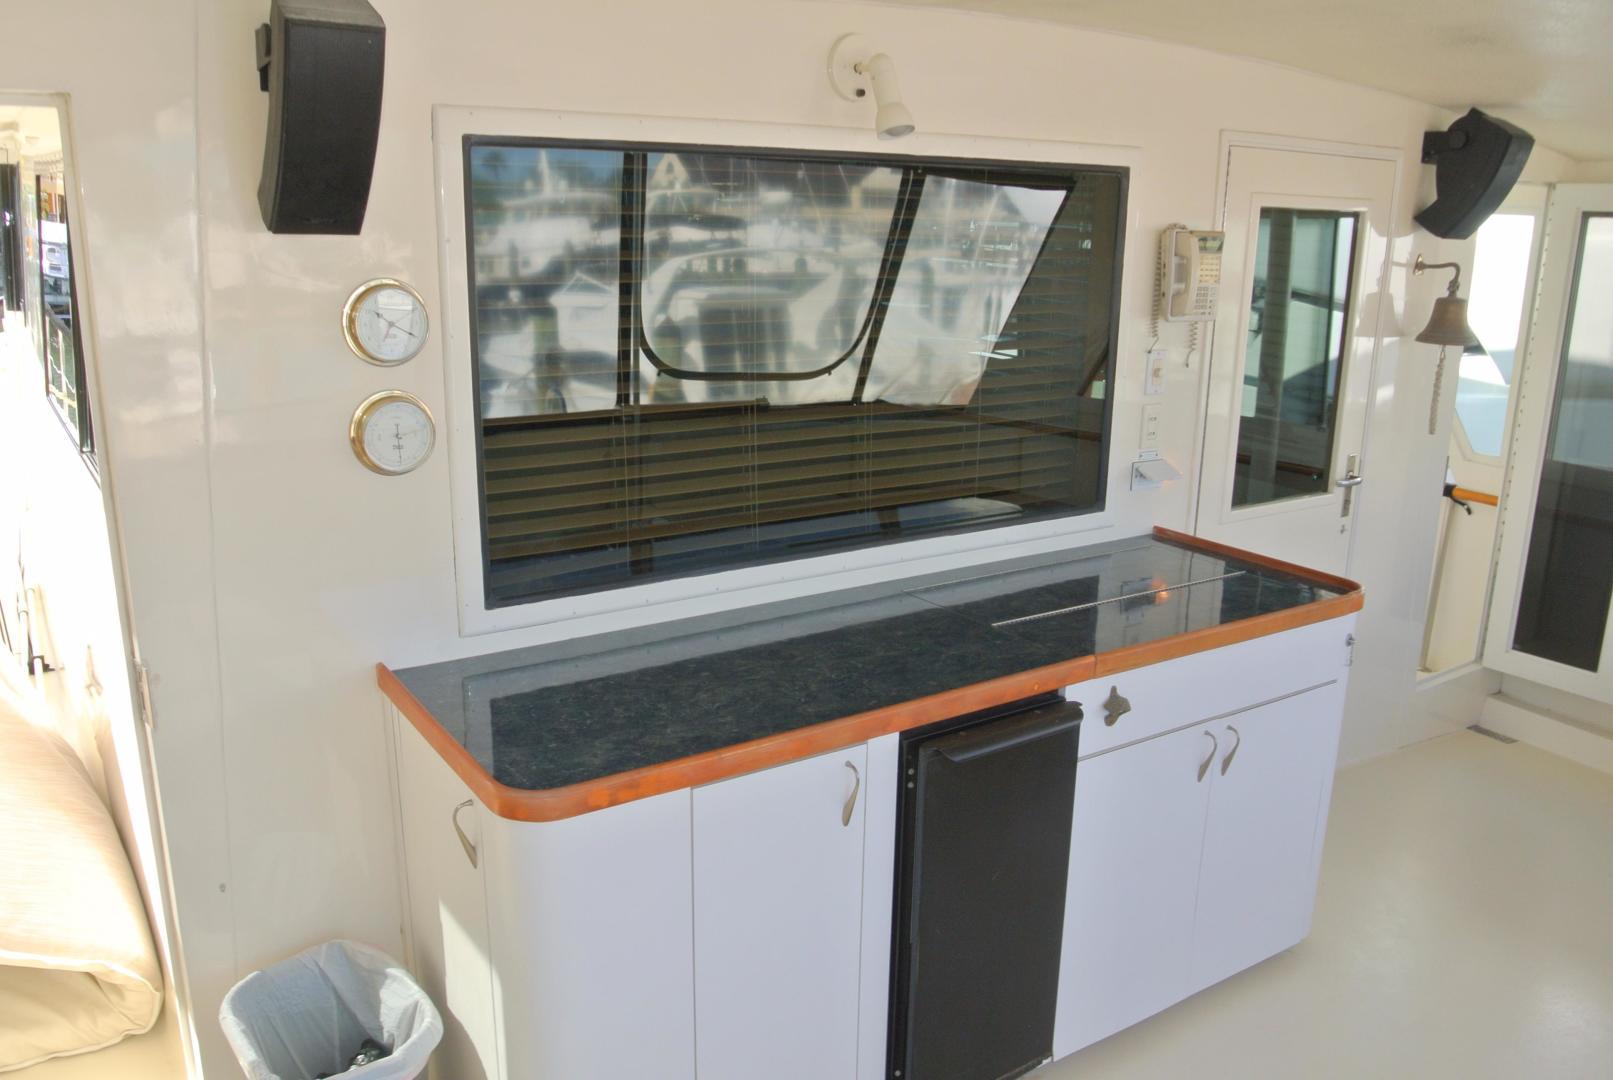 Hatteras-67-Cockpit-Motor-Yacht-1988-Lady-Encore-Saint-Petersburg-Florida-United-States-Wet-Bar-926186